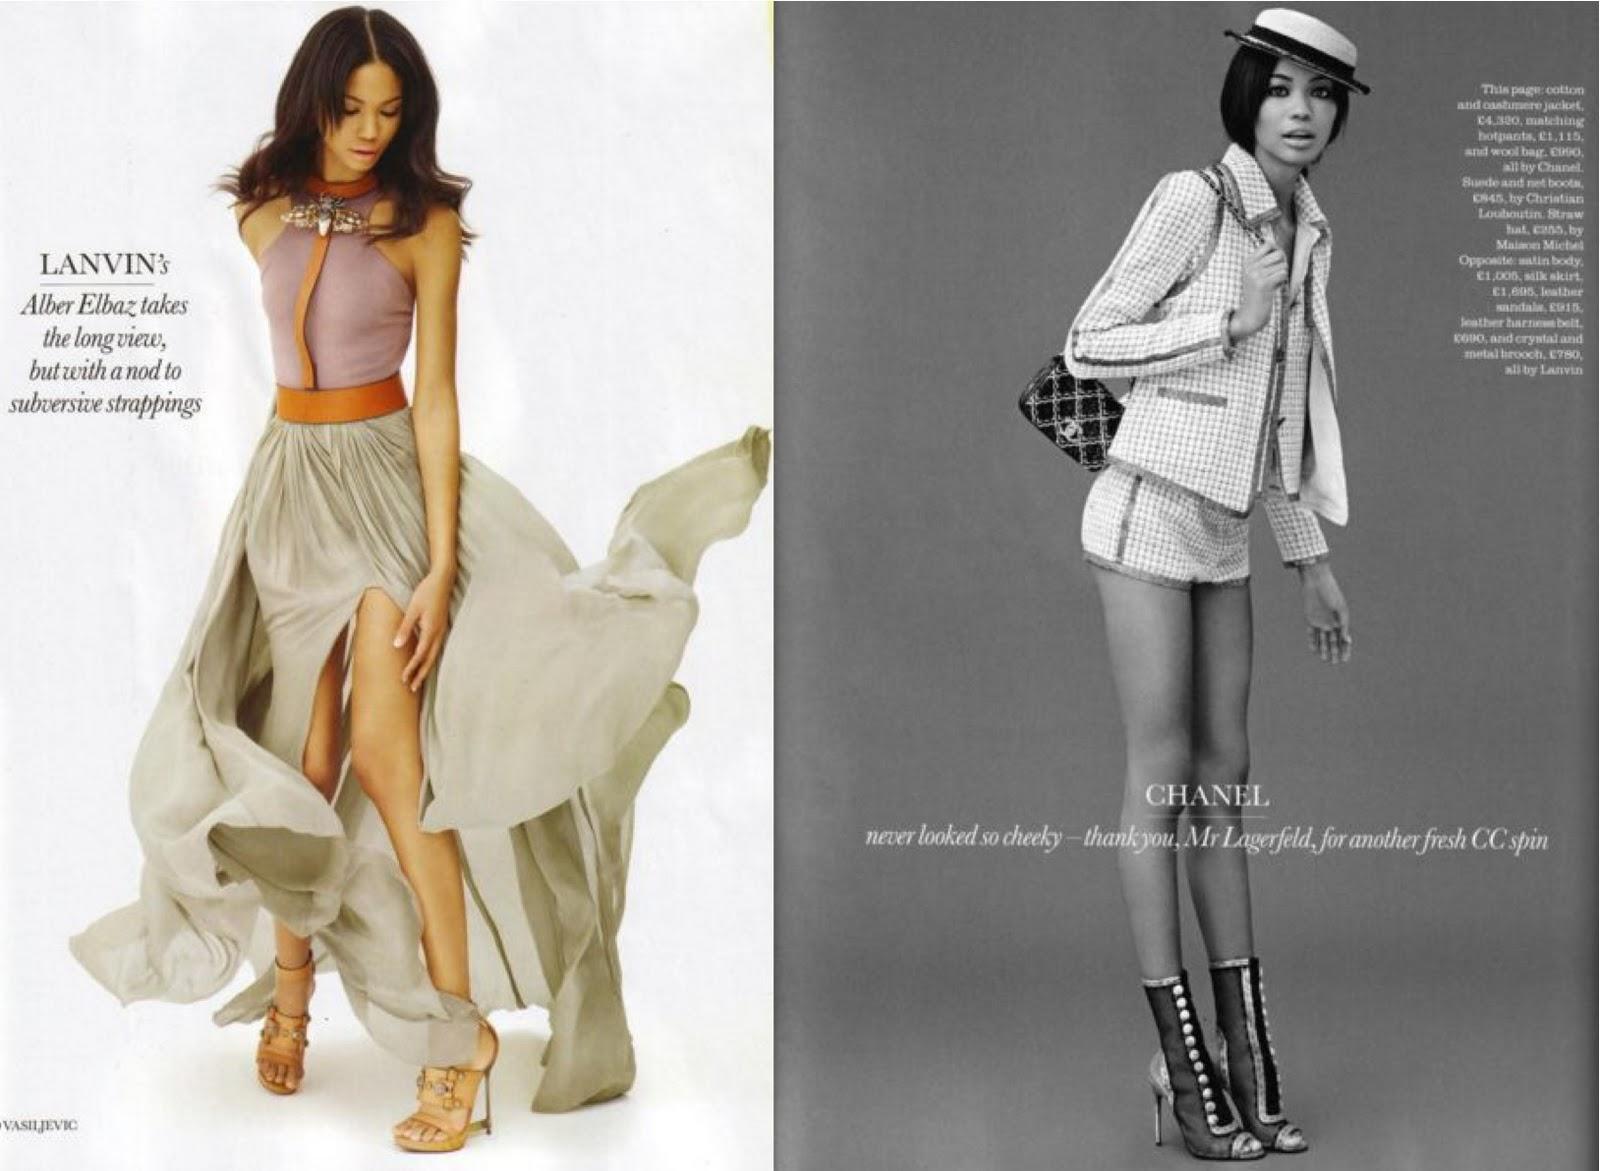 http://2.bp.blogspot.com/_PfmV3qvy8FY/TSvI1MHeleI/AAAAAAAAA5Y/kf-9l4pyMi8/s1600/la+modella+mafia+Chanel+Iman+Elle+UK+February+2011+by+David+Vasiljevic+3.jpg